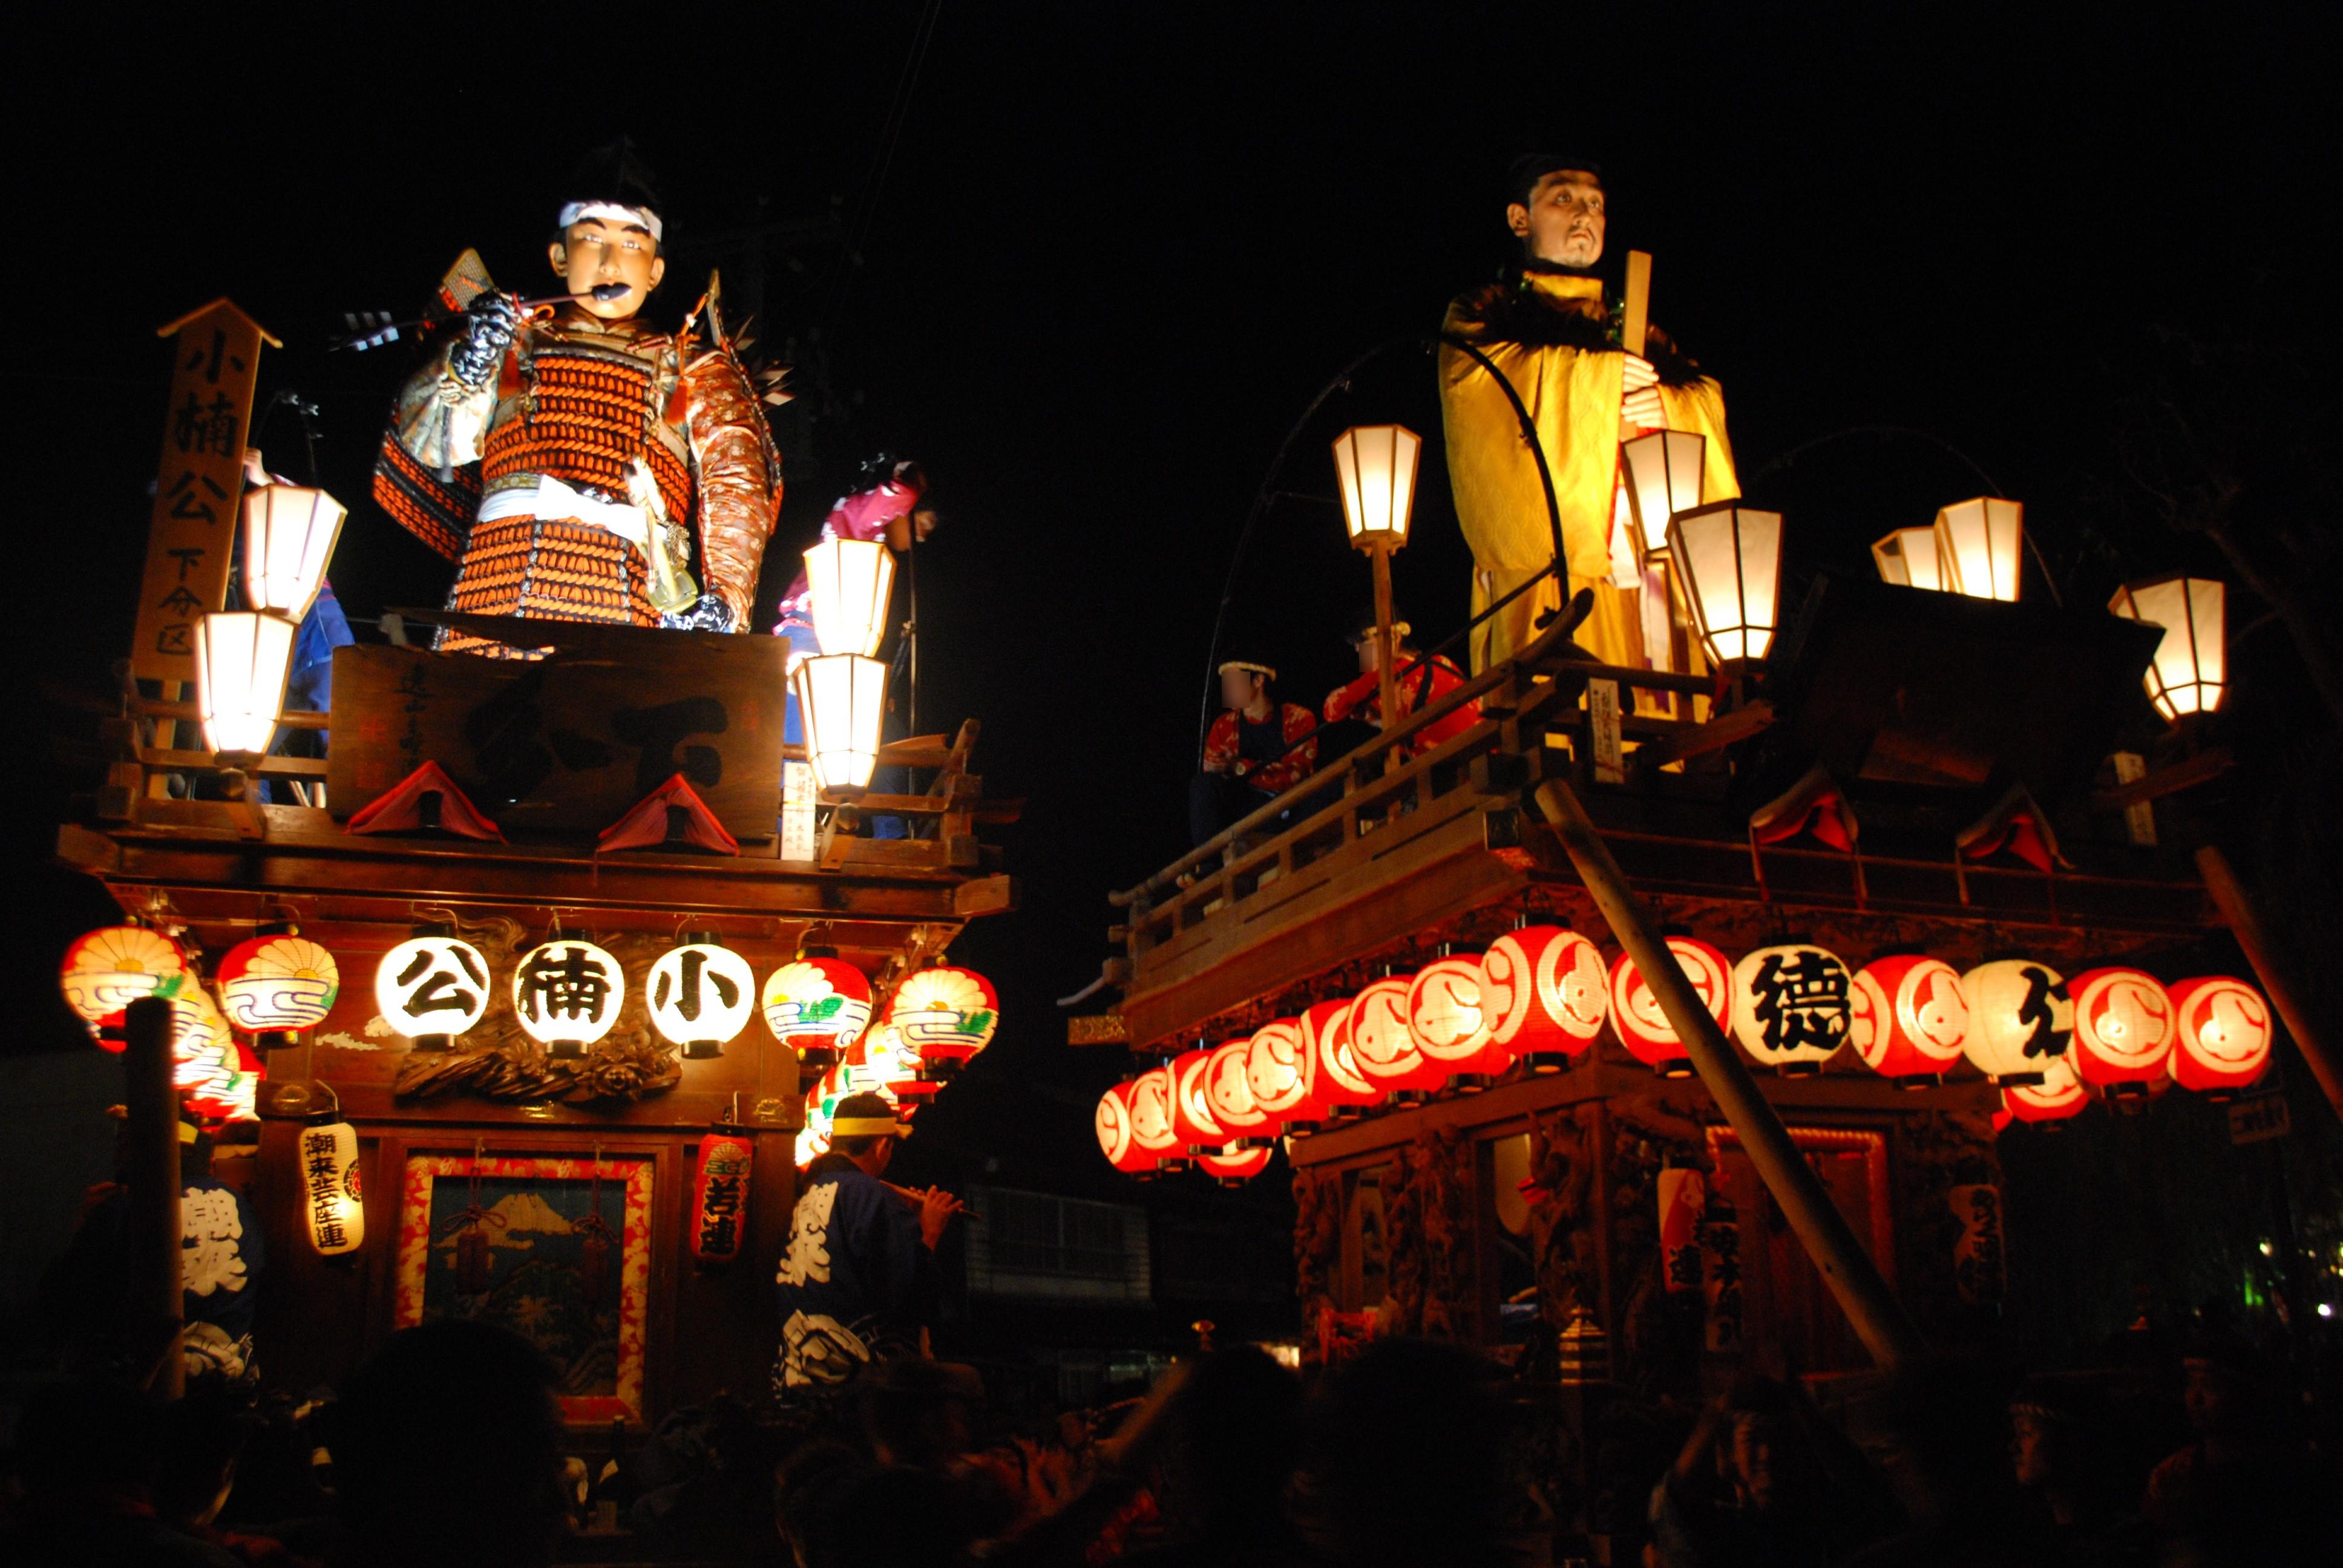 filesawara festival in autumnkatoricityjapanjpg